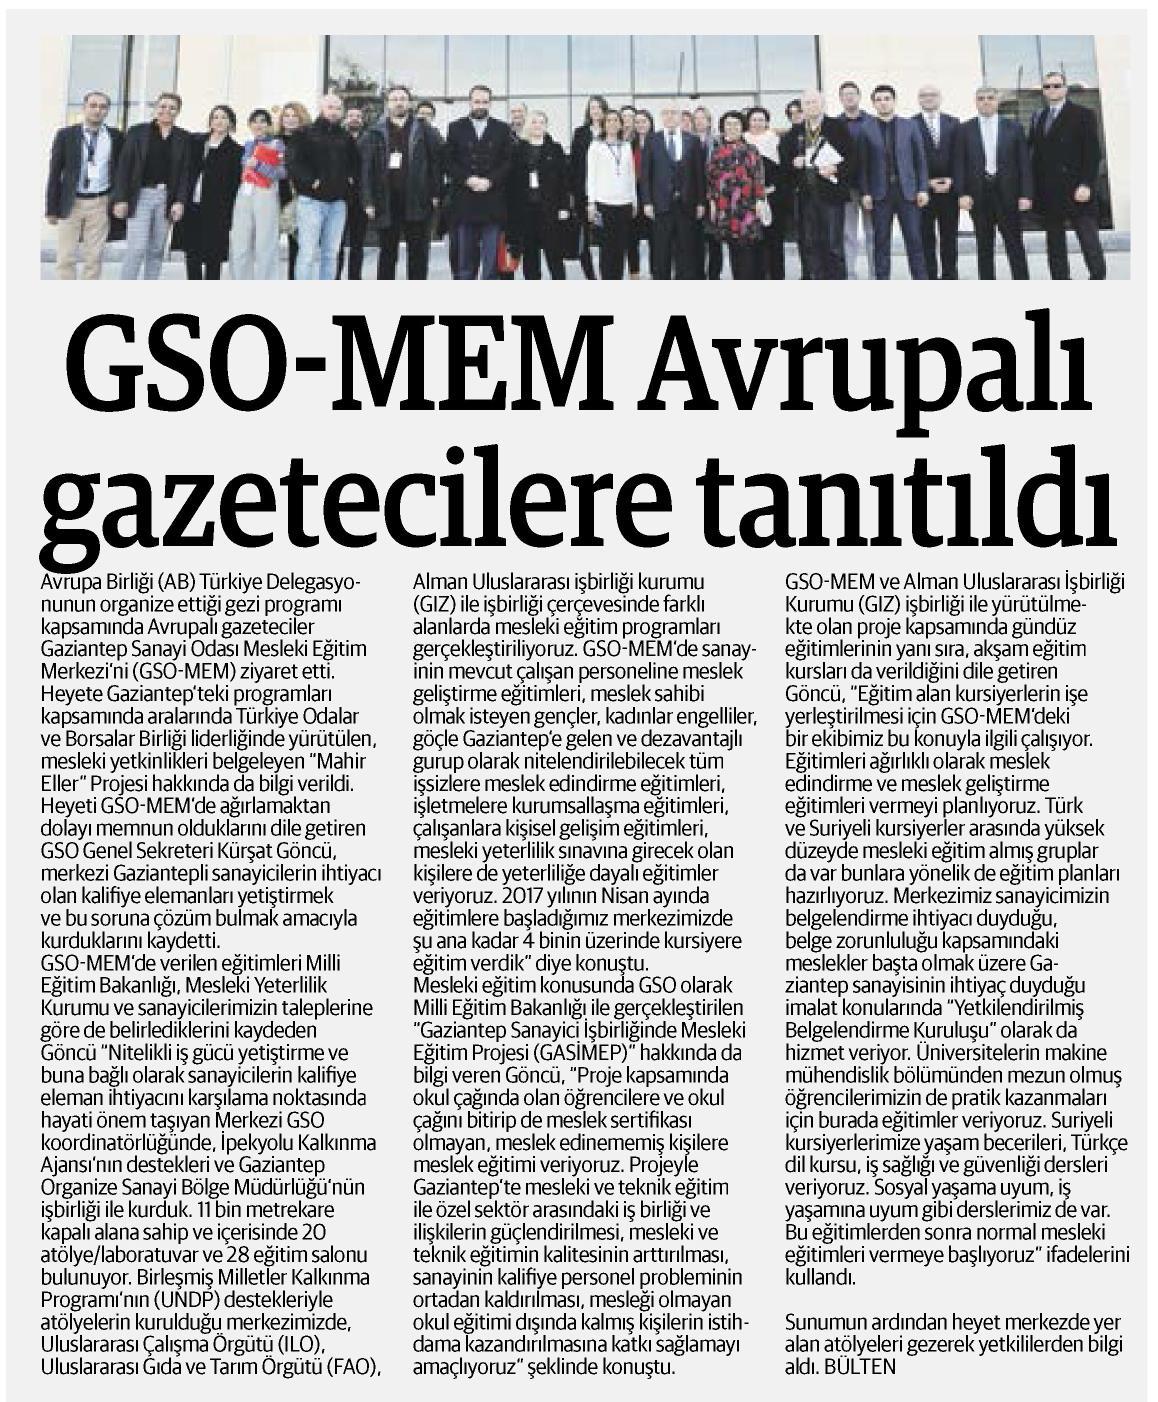 GSO-MEM Avrupalı gazetecilere tanıtıldı. Referans